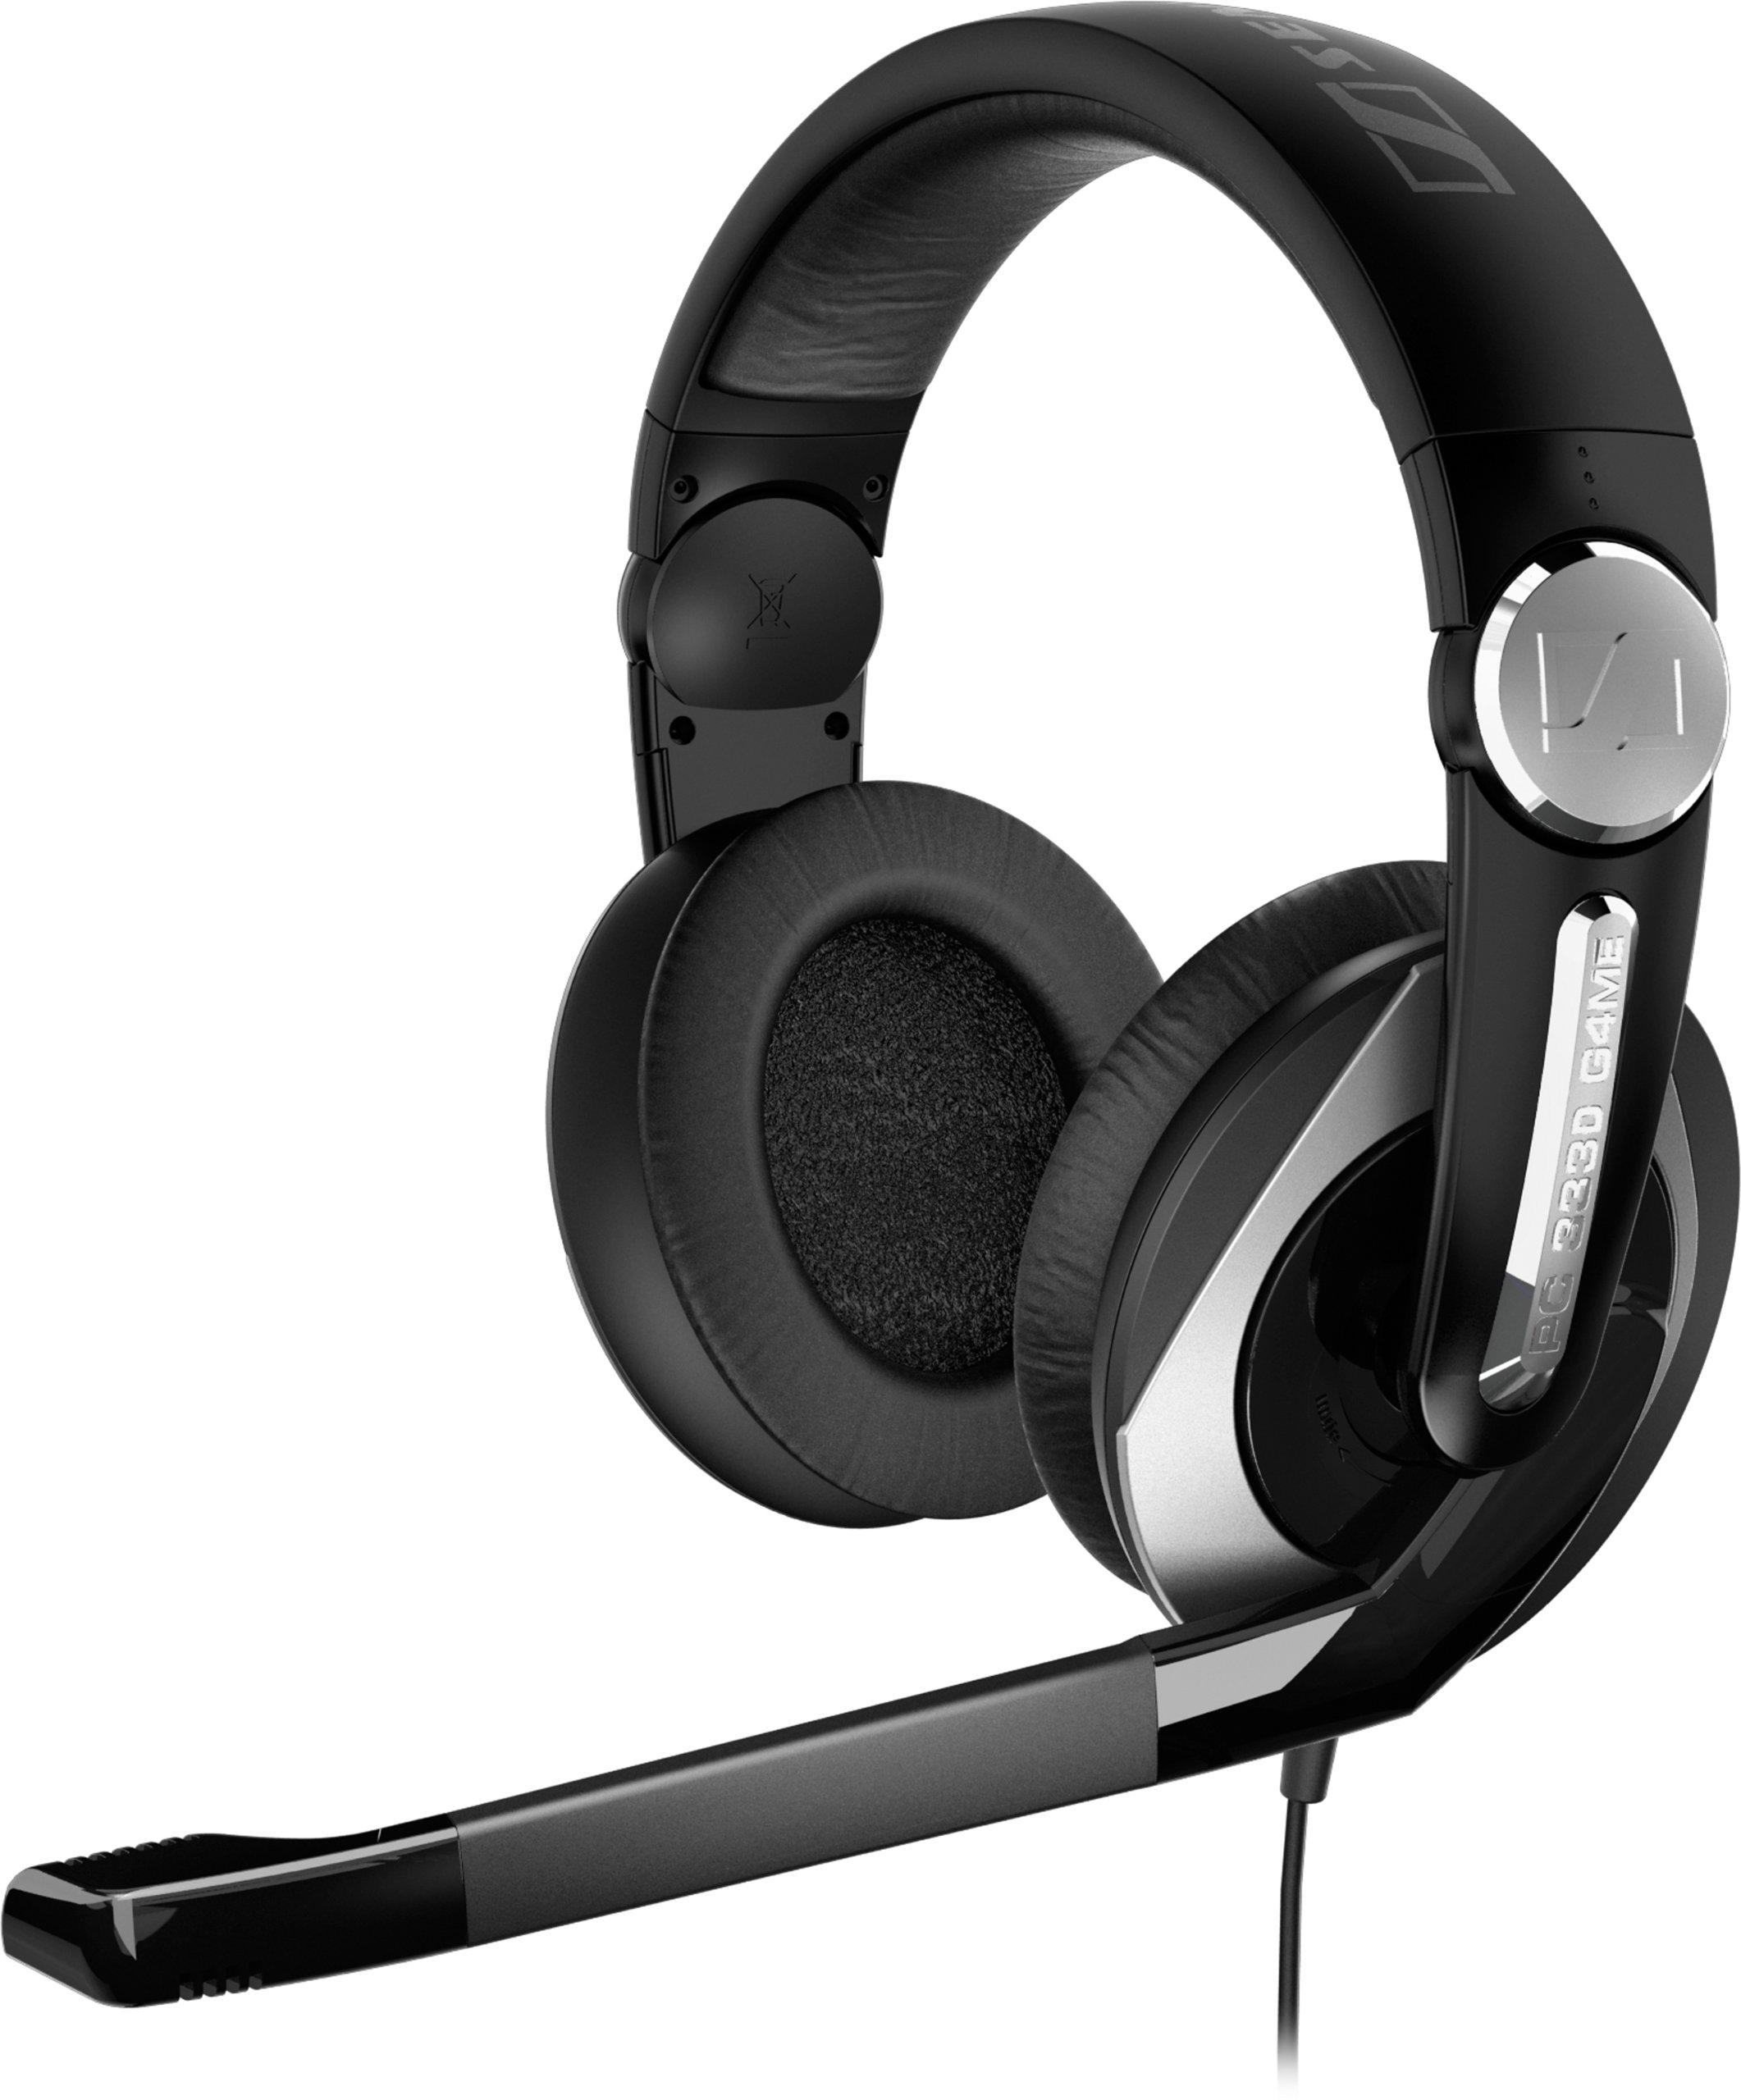 Sennheiser PC 333D Gaming Headset by Sennheiser (Image #1)